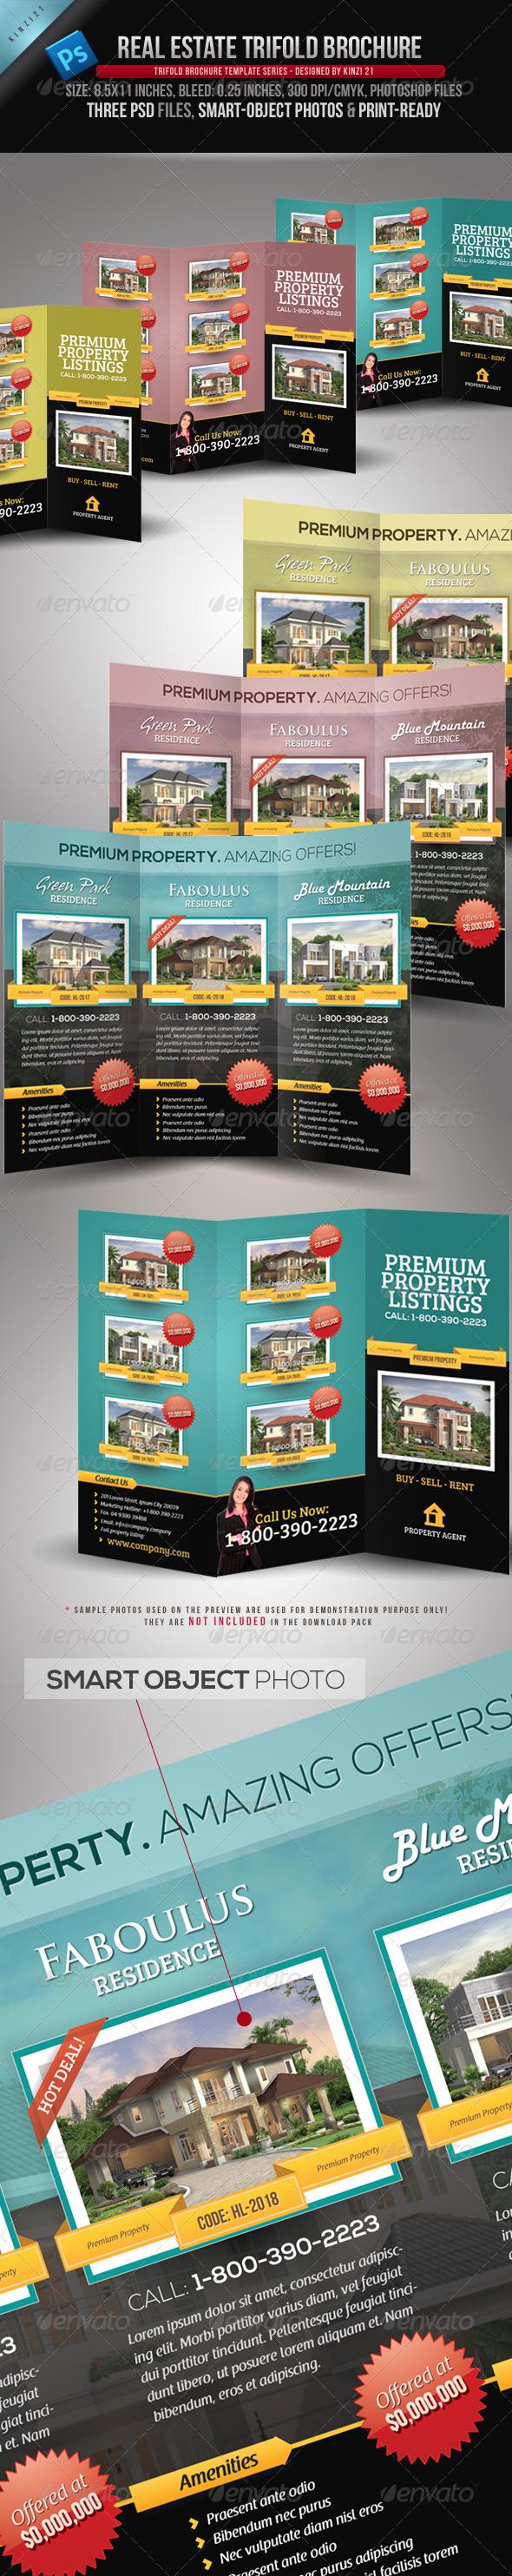 GraphicRiver Real Estate Trifold Brochure 3476995